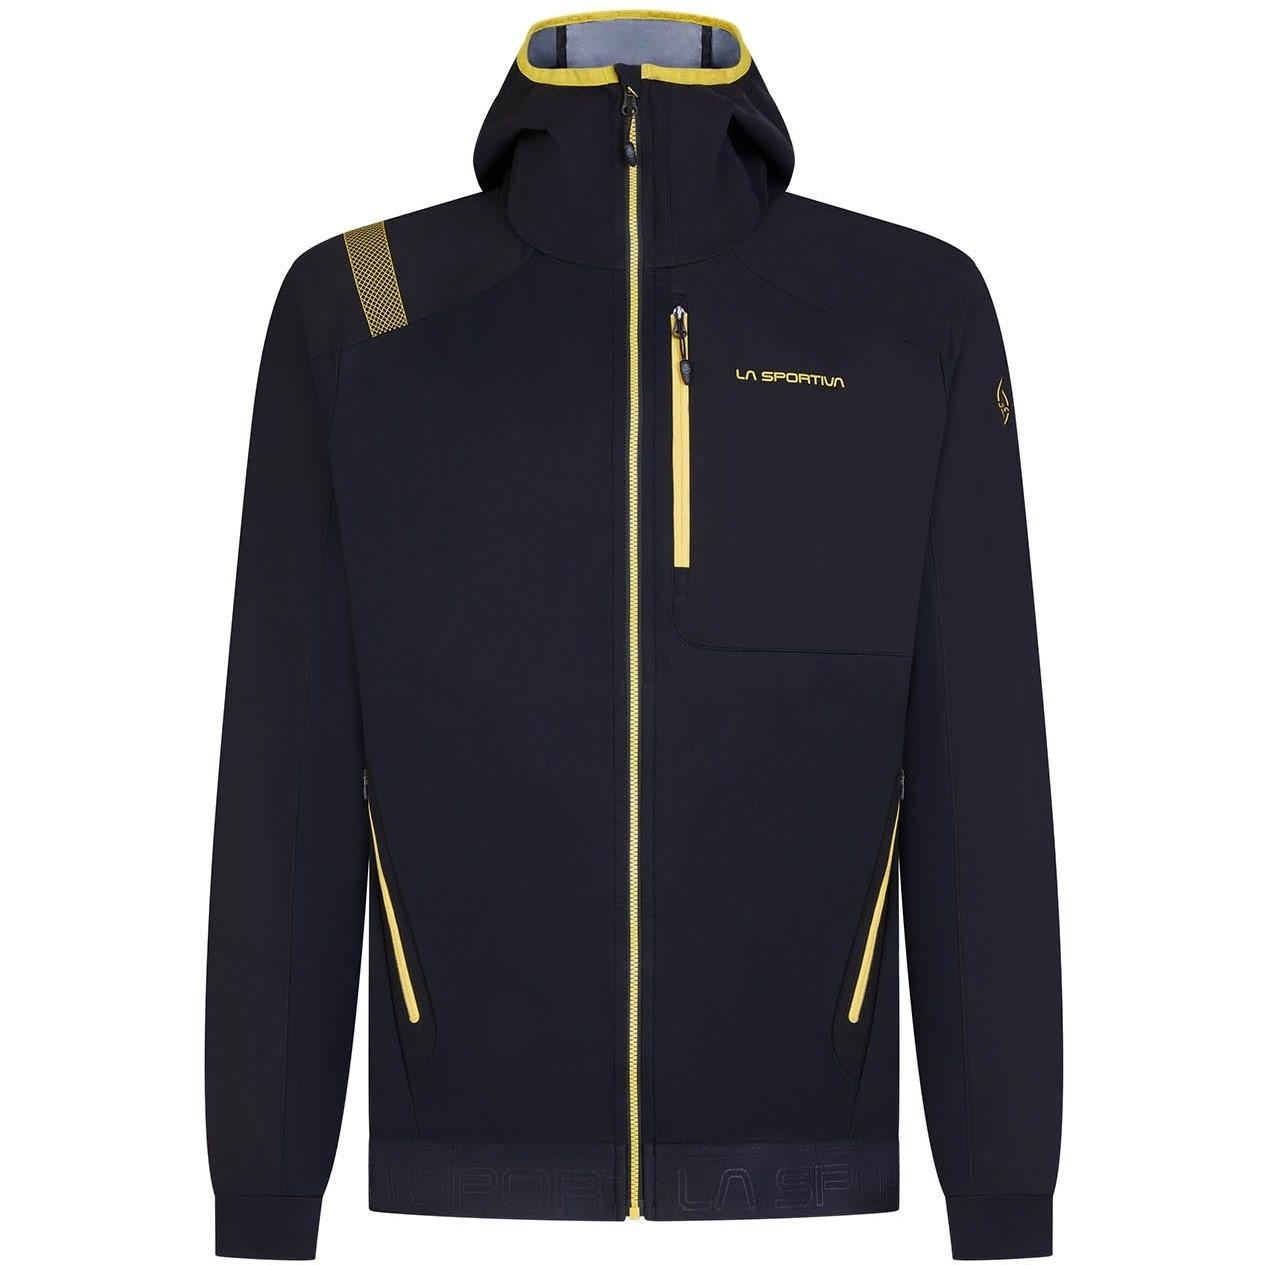 La Sportiva Macnas Hoody Jacket - Black